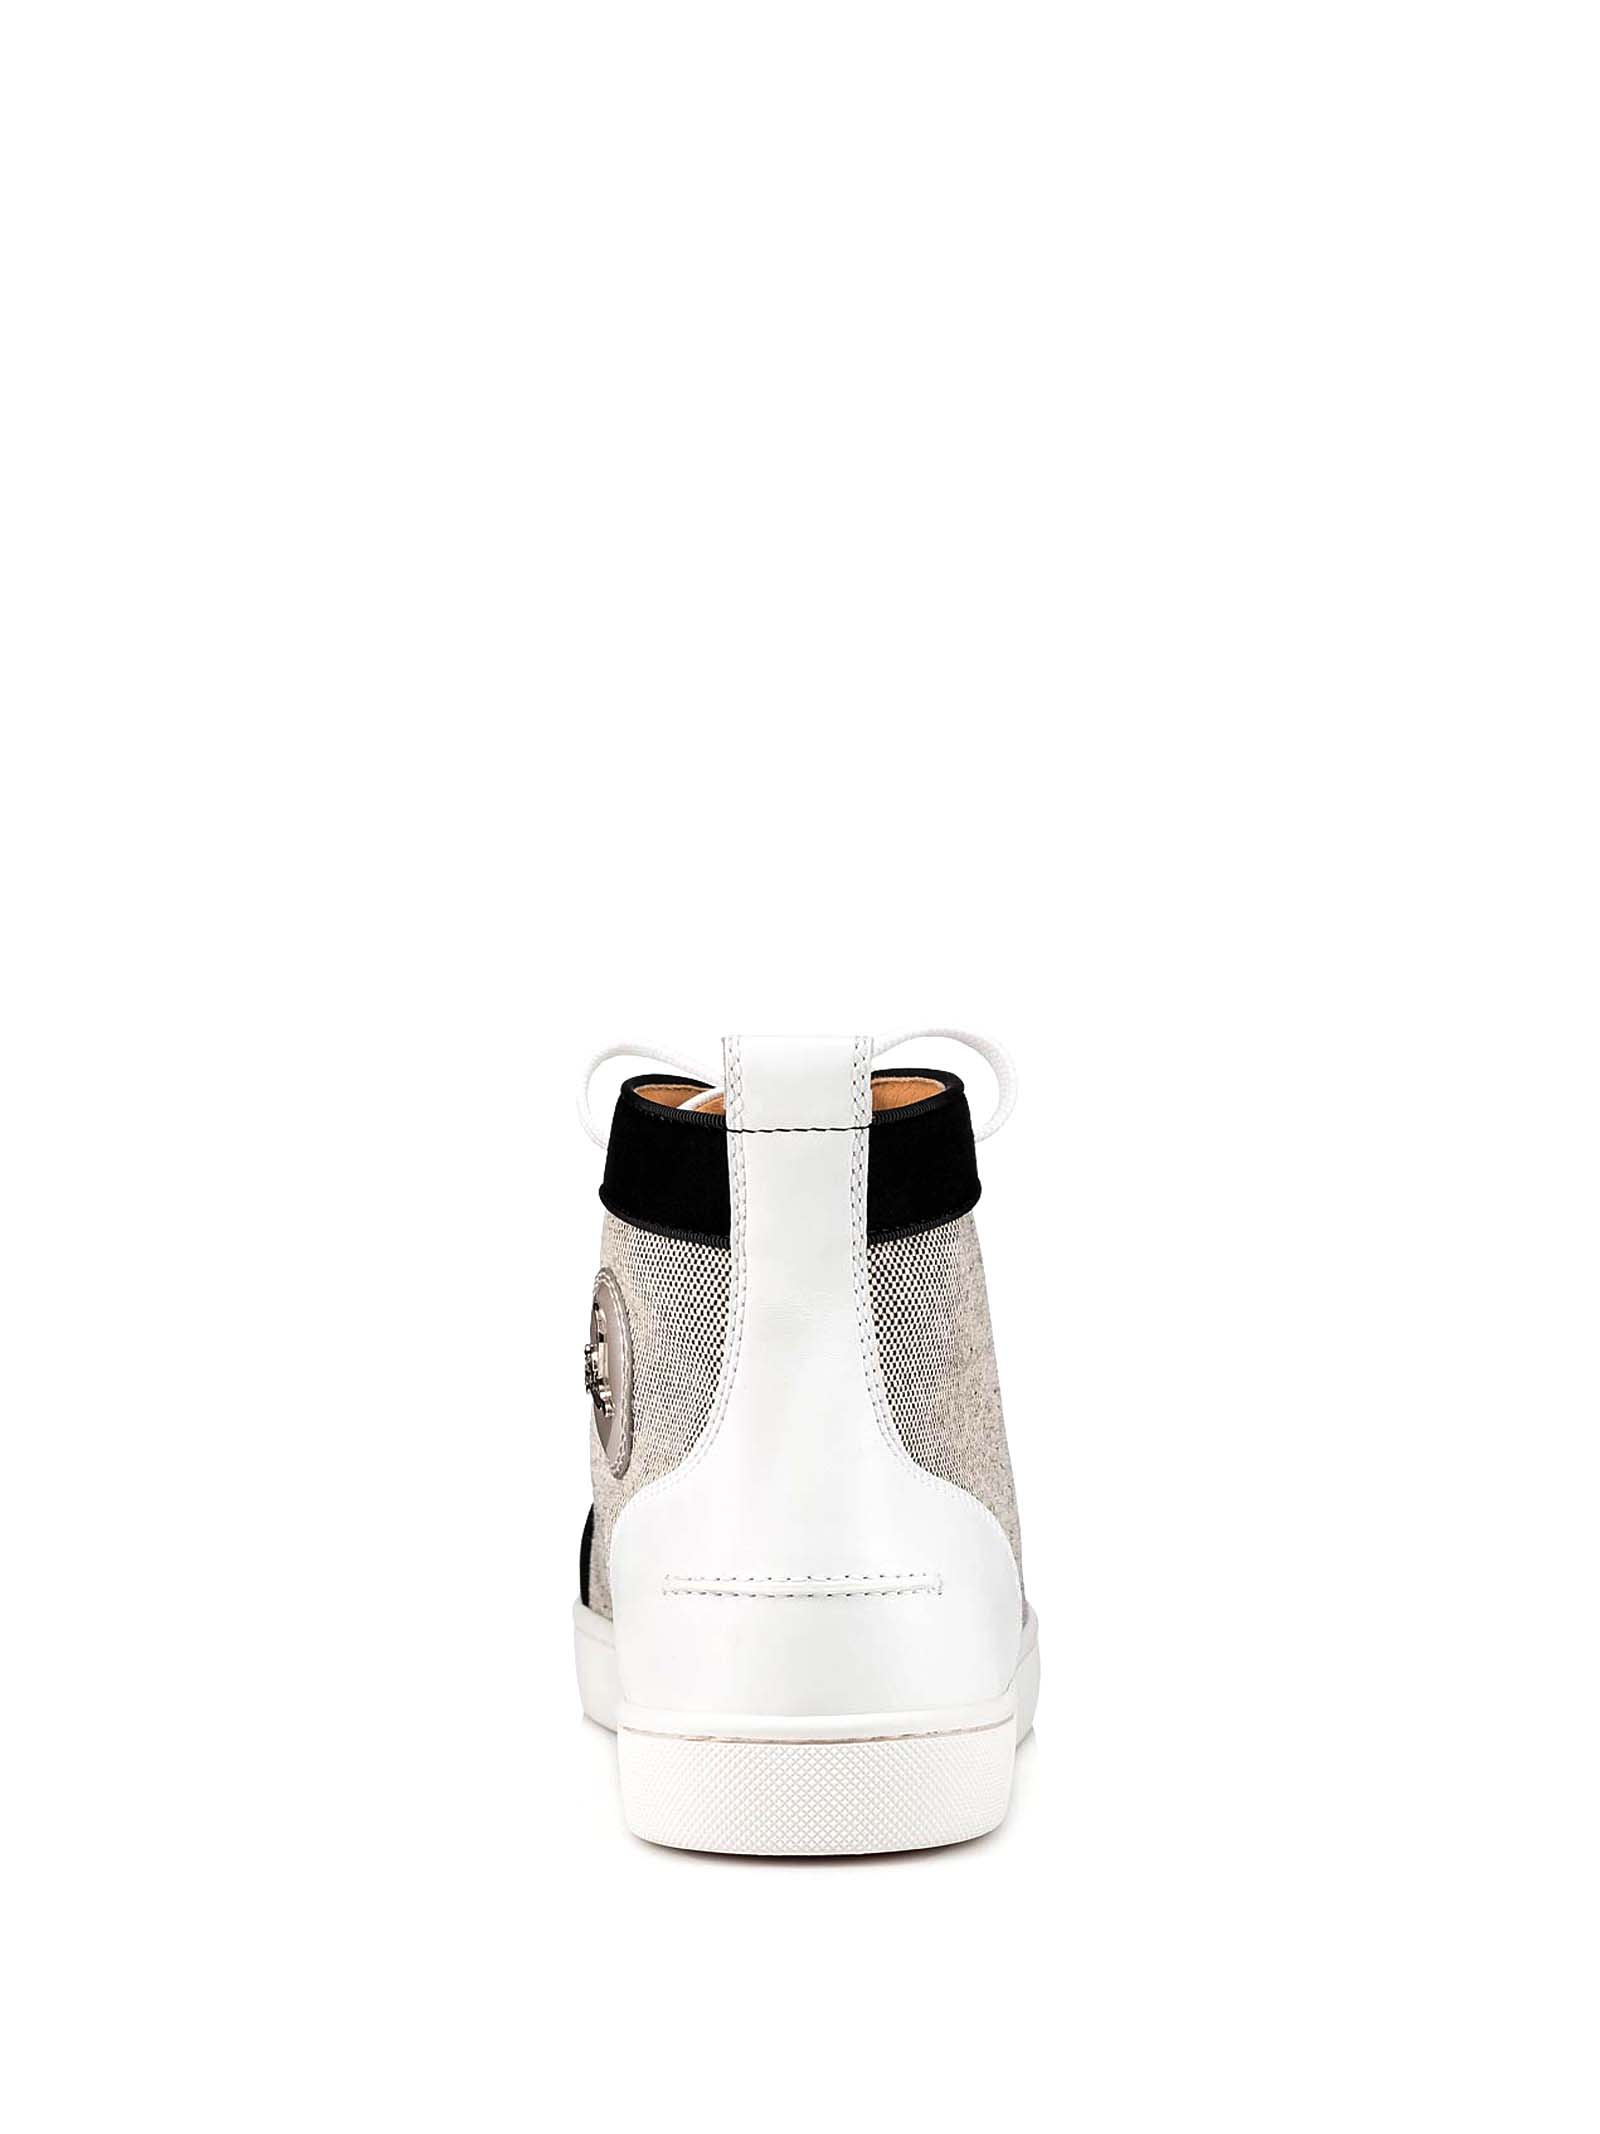 the latest 01b0d b96cc Christian Louboutin Louboutin Lou Spikes Orlato Sneakers